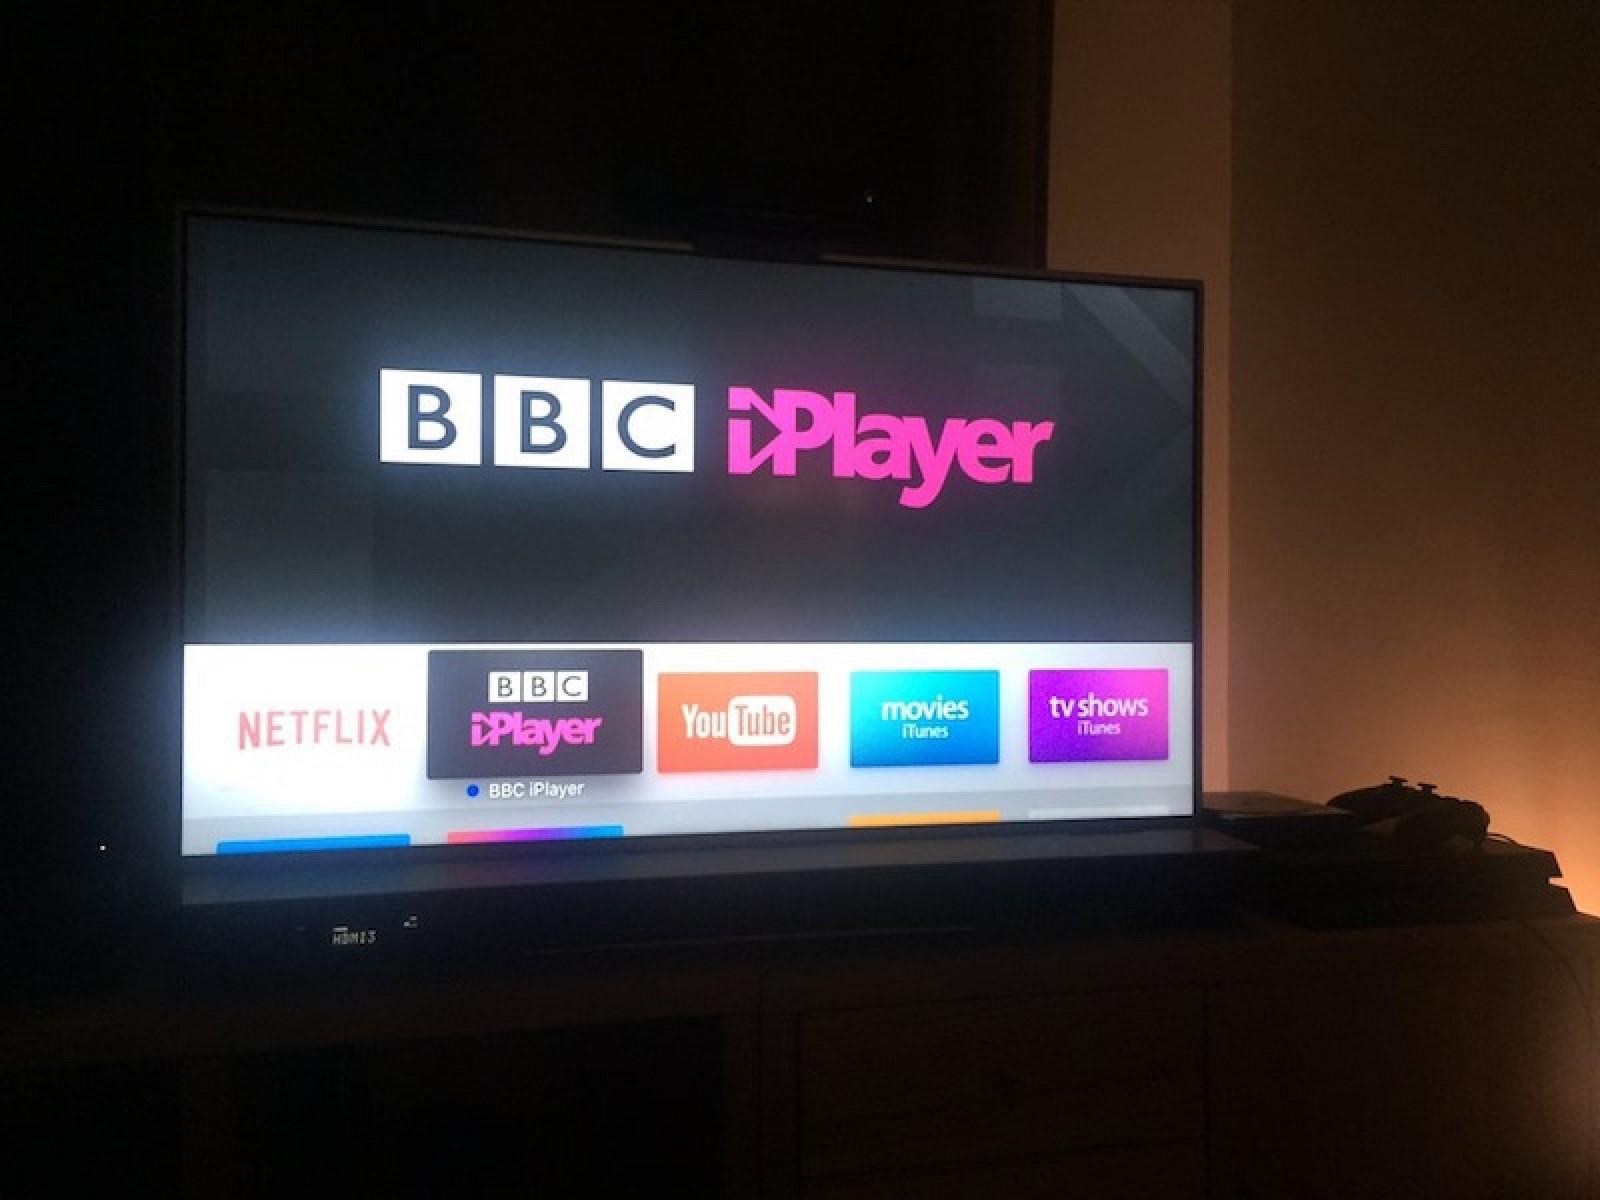 Bbc Iplayer Goes Live On New Apple Tv In The Uk Mac Rumors